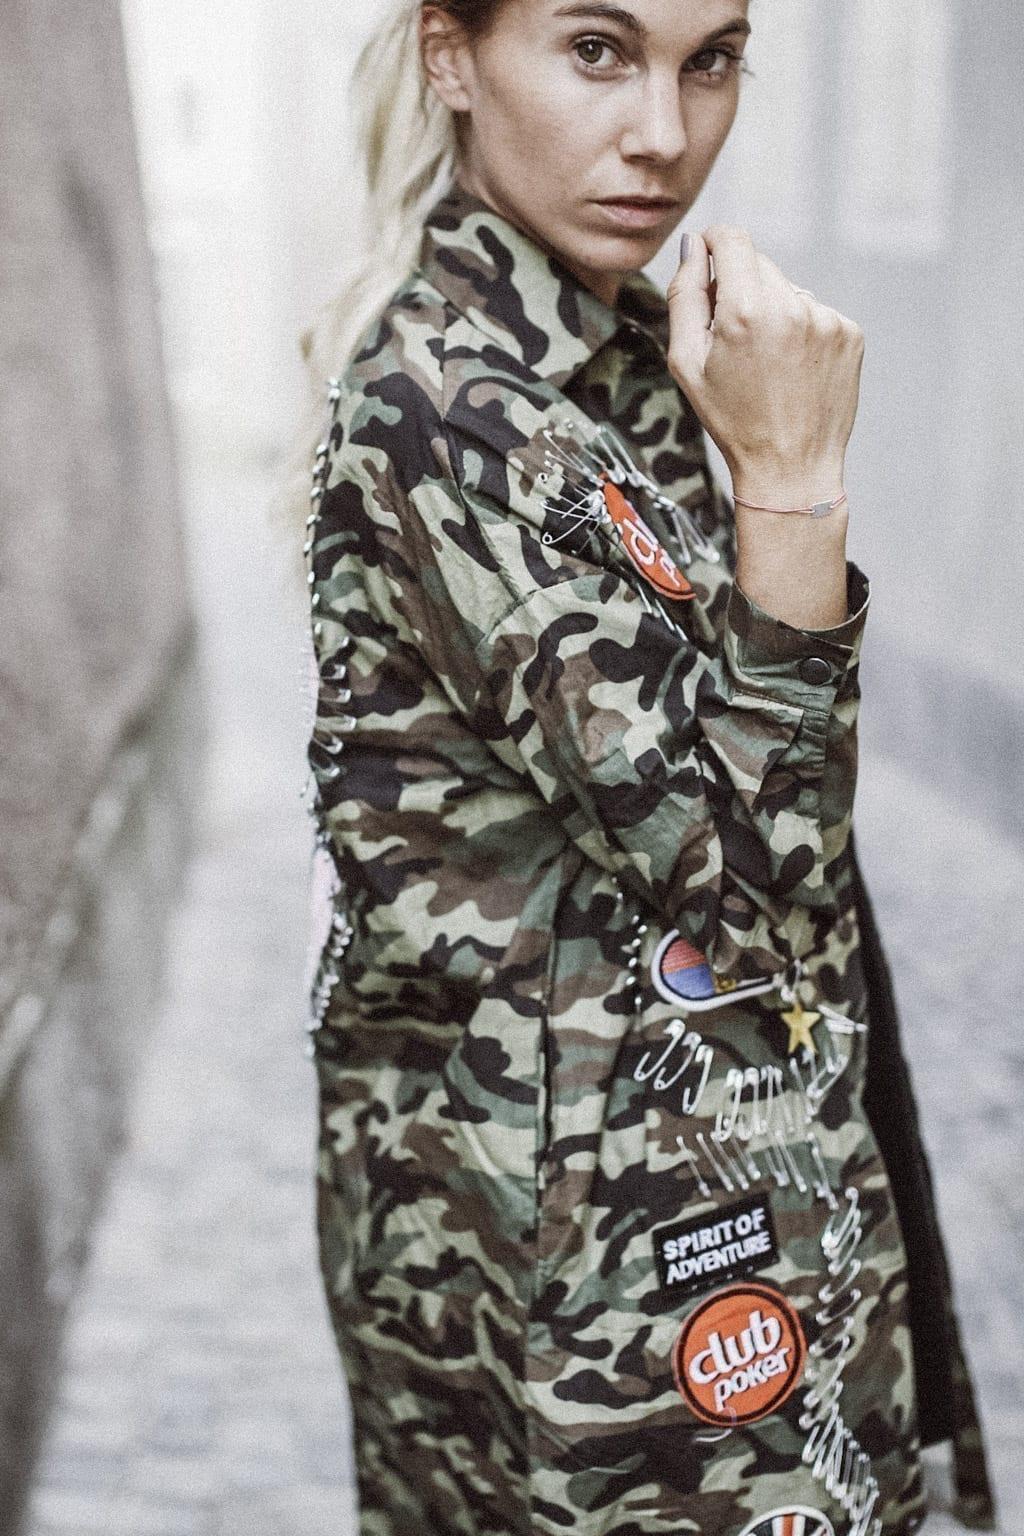 CK-1606_salzburg-fashion-street-style-look-magazine-karin-kaswurm-electric-love-2016-festival-camouflage-military-jacket-8967